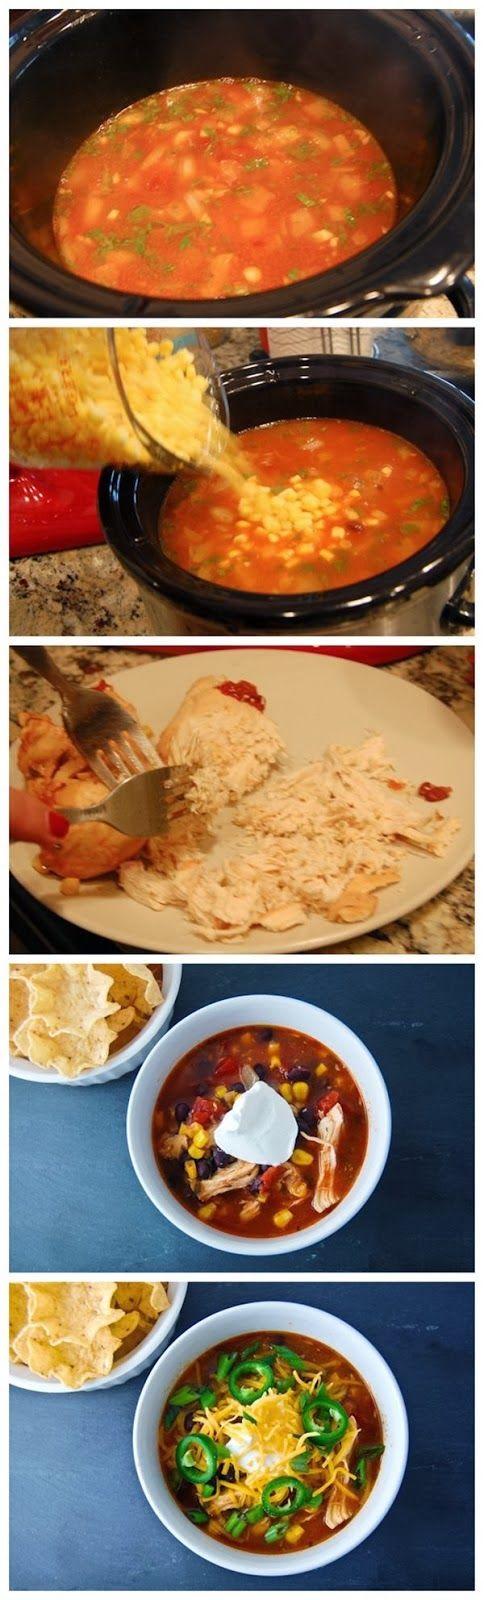 #Recipe : Chicken Enchilada Soup